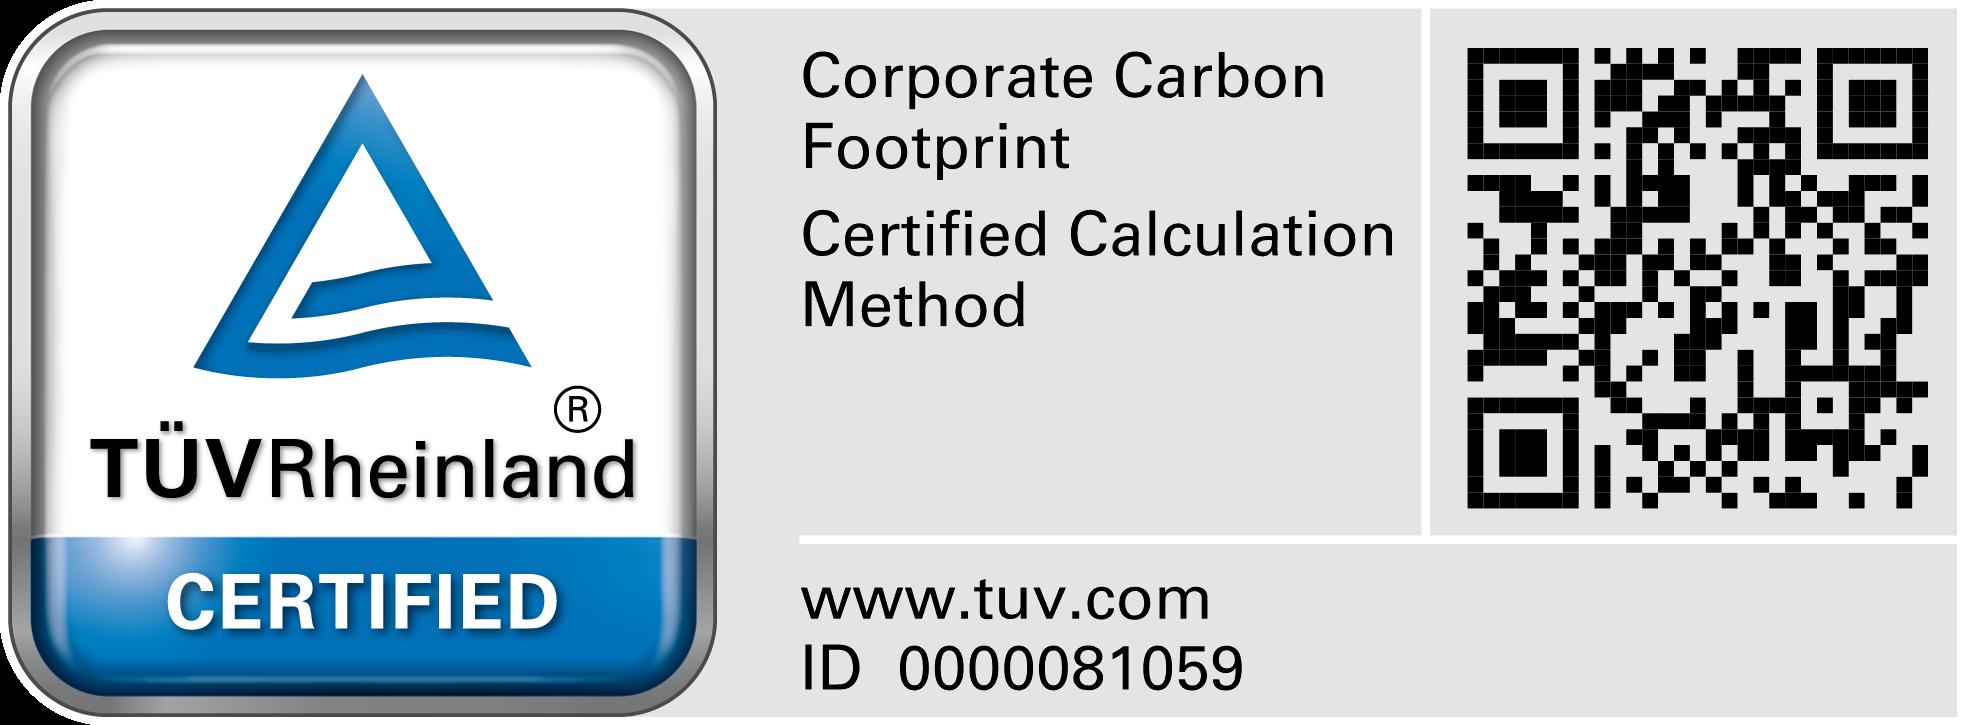 Plan A Certification badge